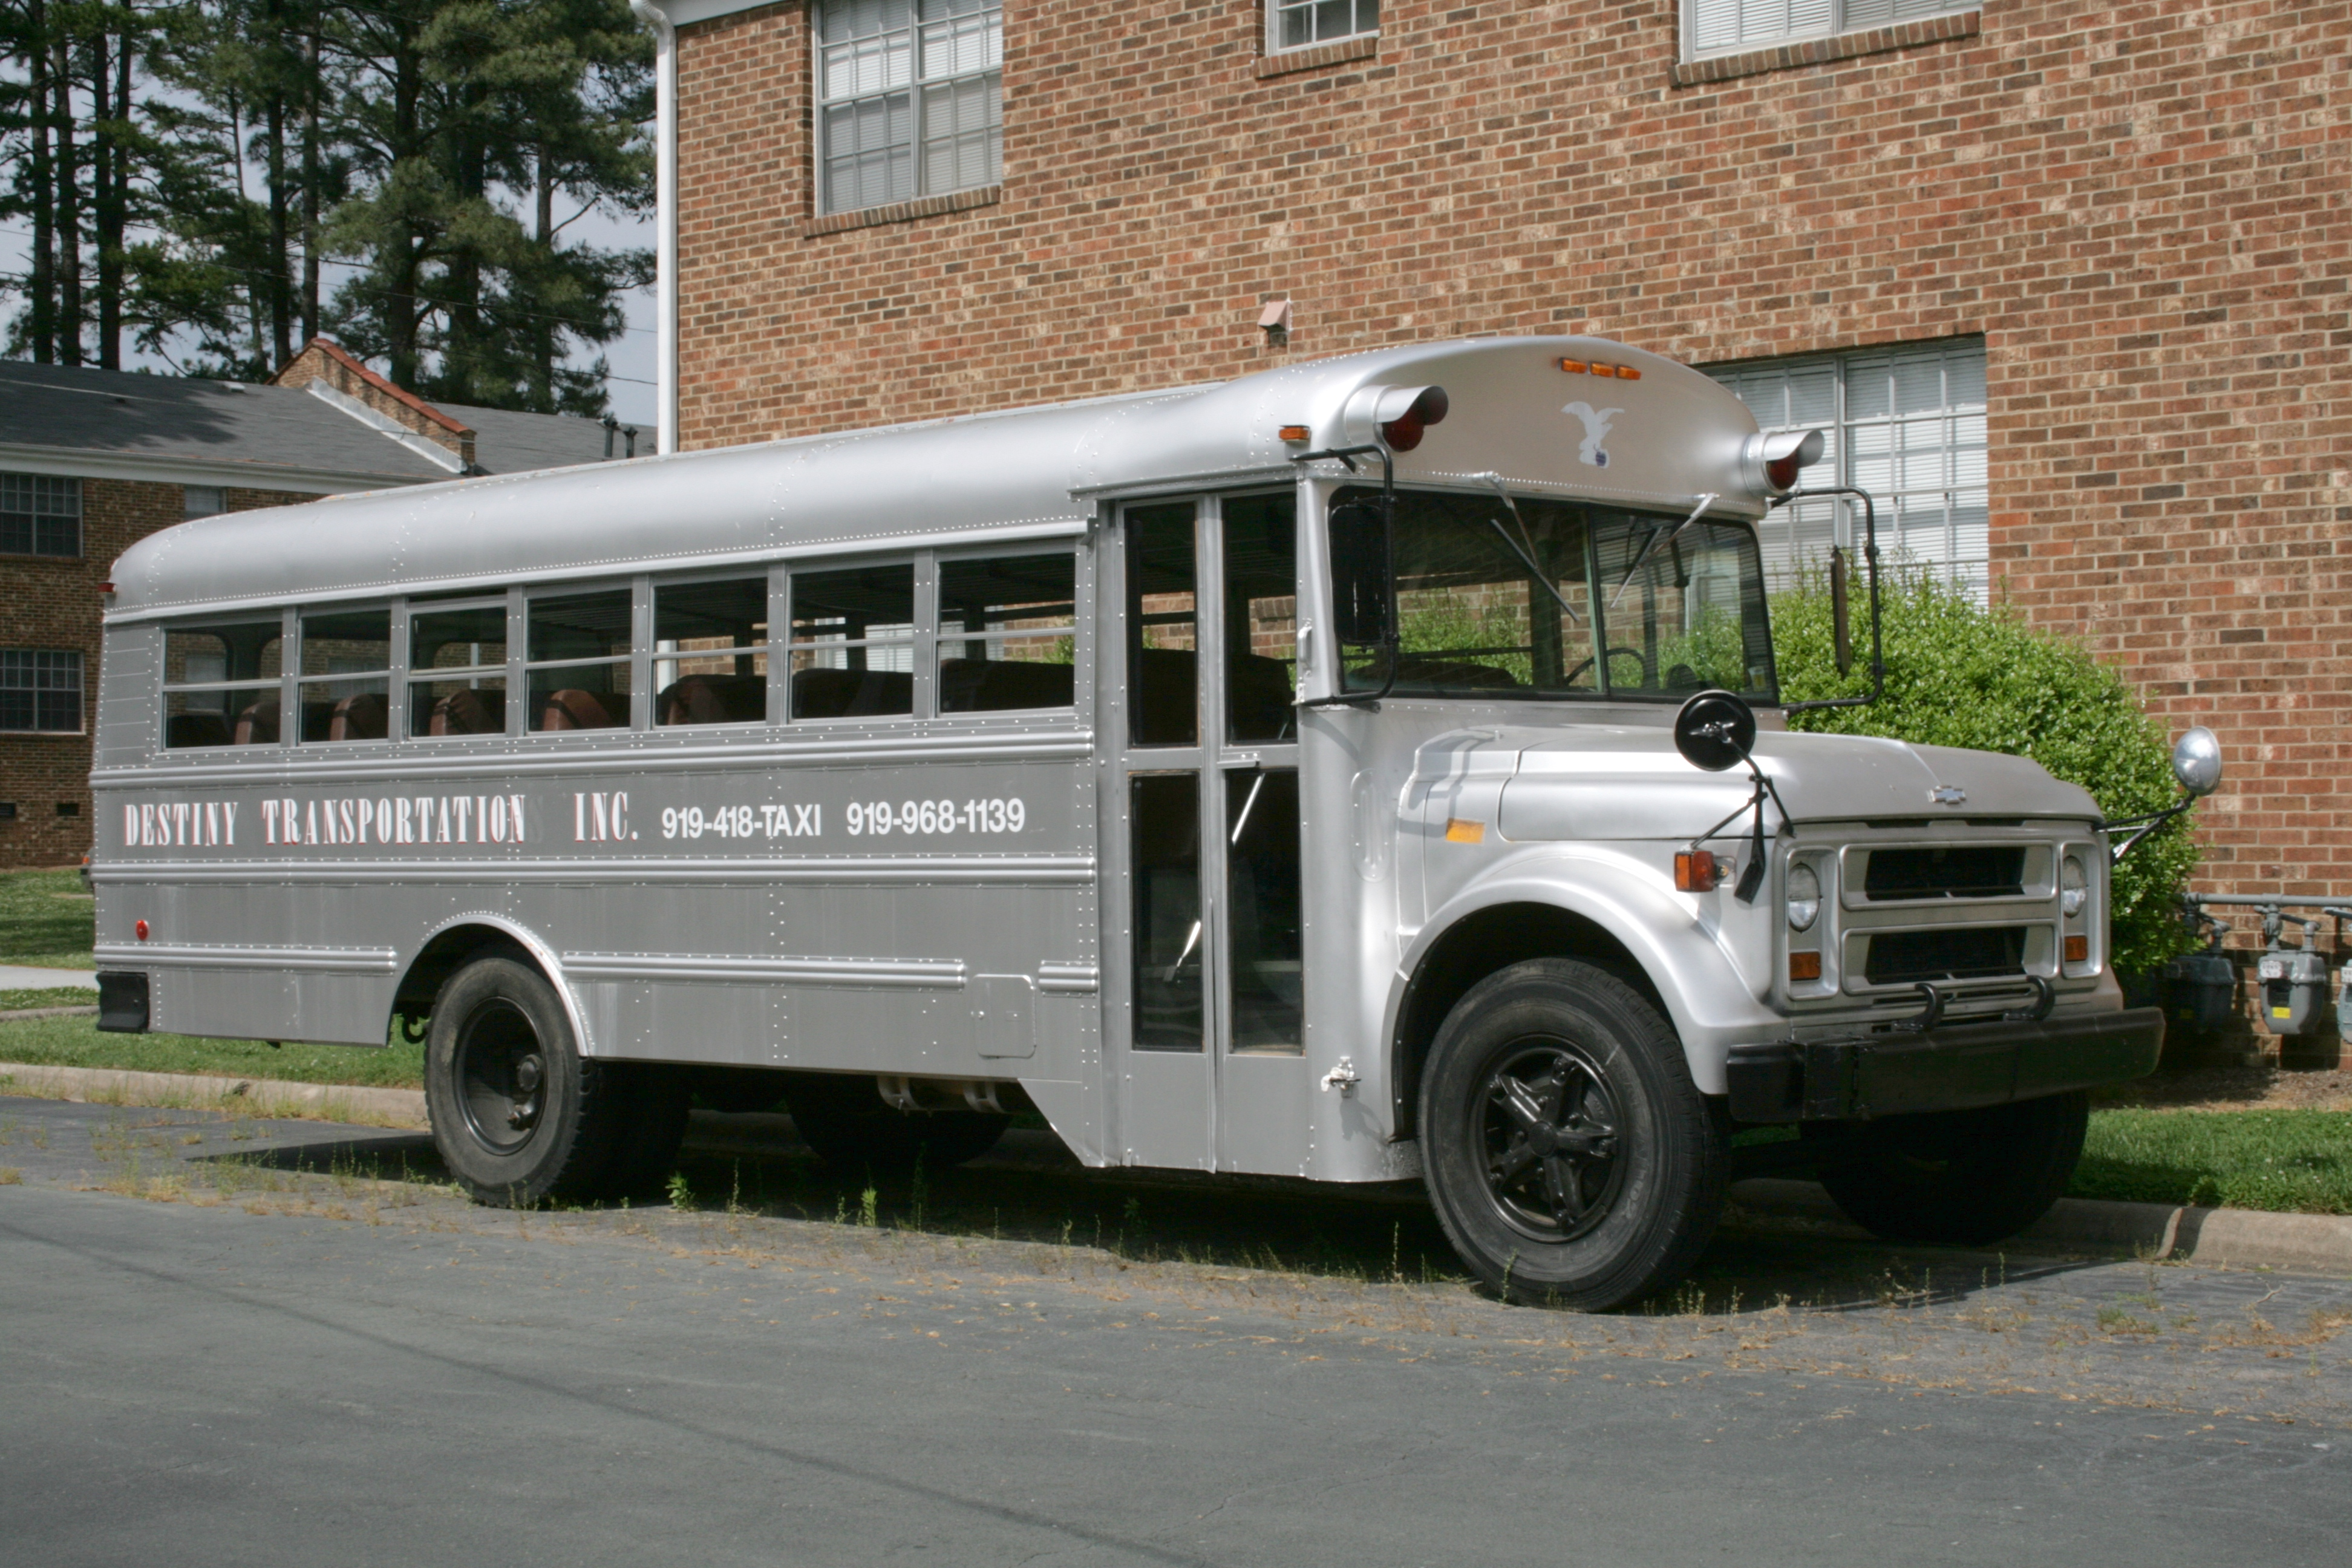 file 2009 05 03 destiny transportation school bus taxi 1984 chevy truck wiring diagram c20 1983 chevy truck wiring diagram manual